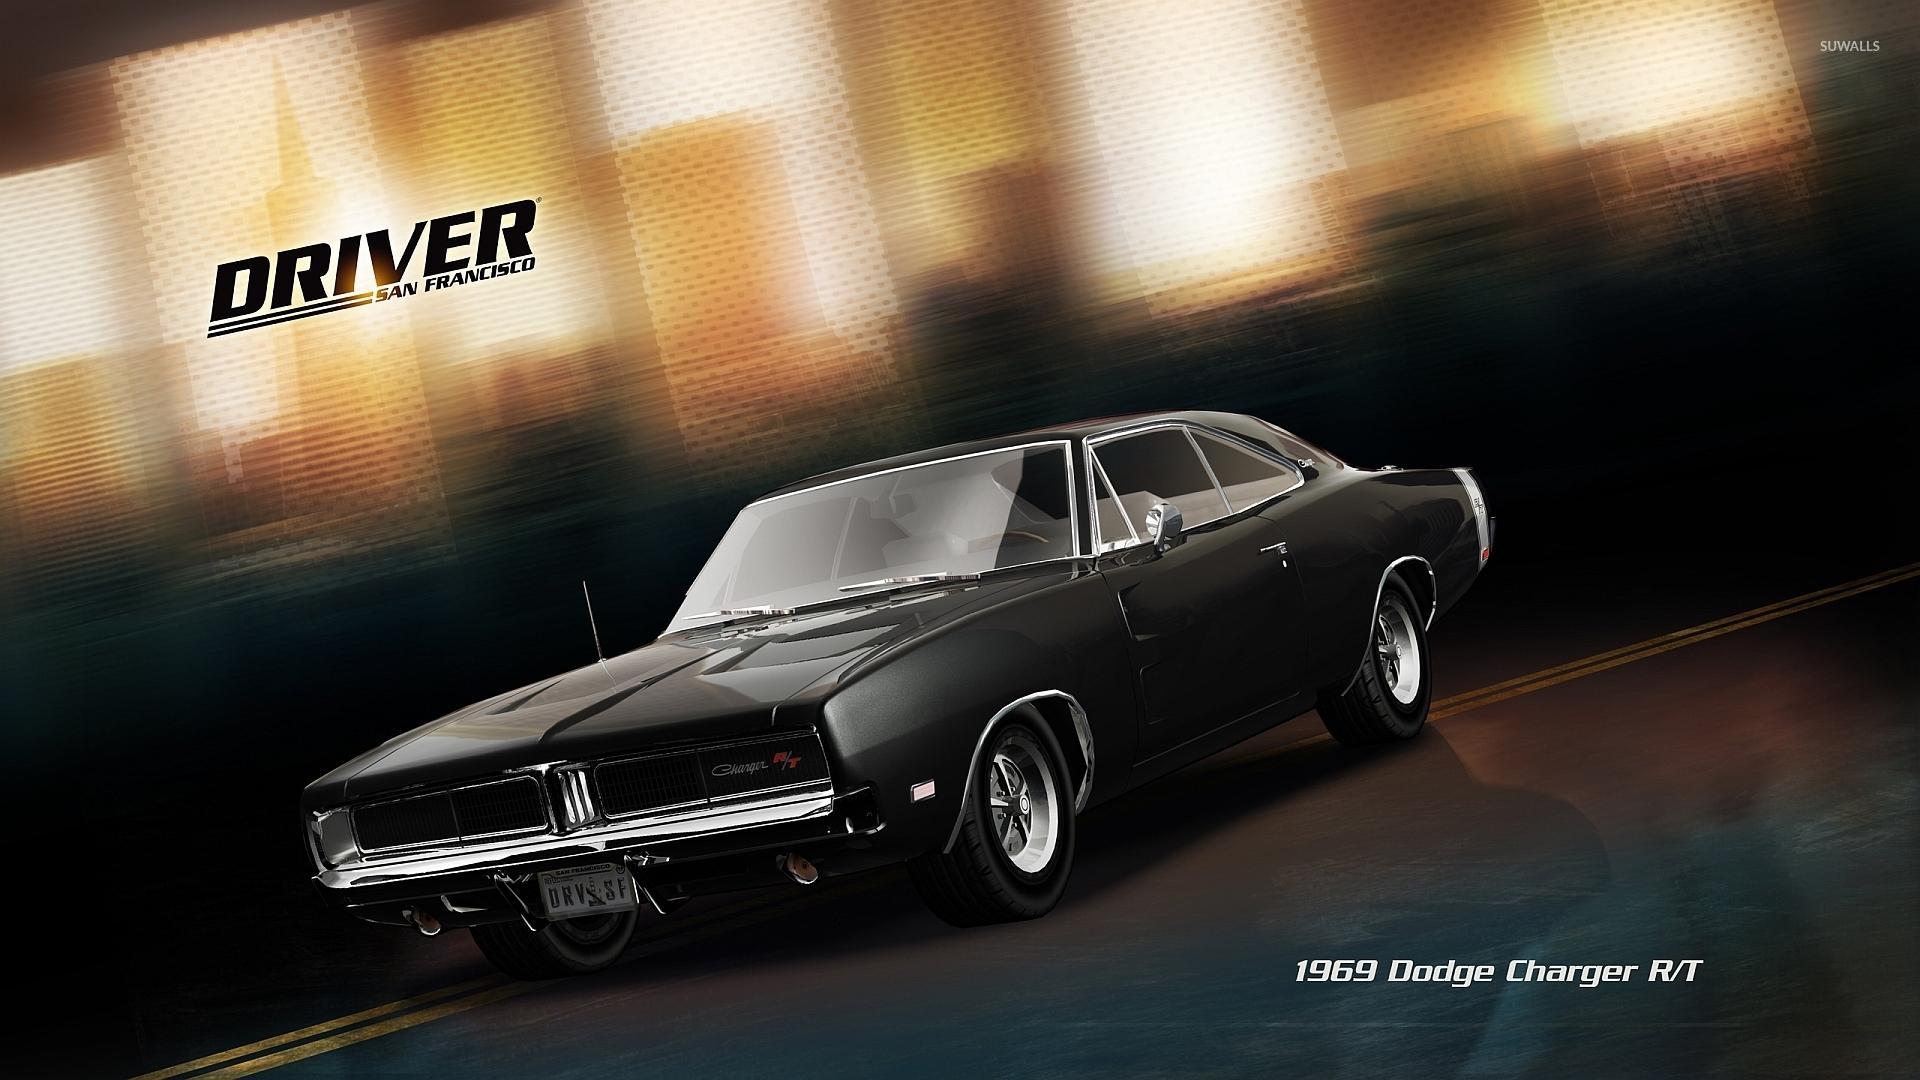 Dodge Challenger 1969 Black >> 1969 Dodge Charger R/T - Driver: San Francisco wallpaper - Game wallpapers - #34081